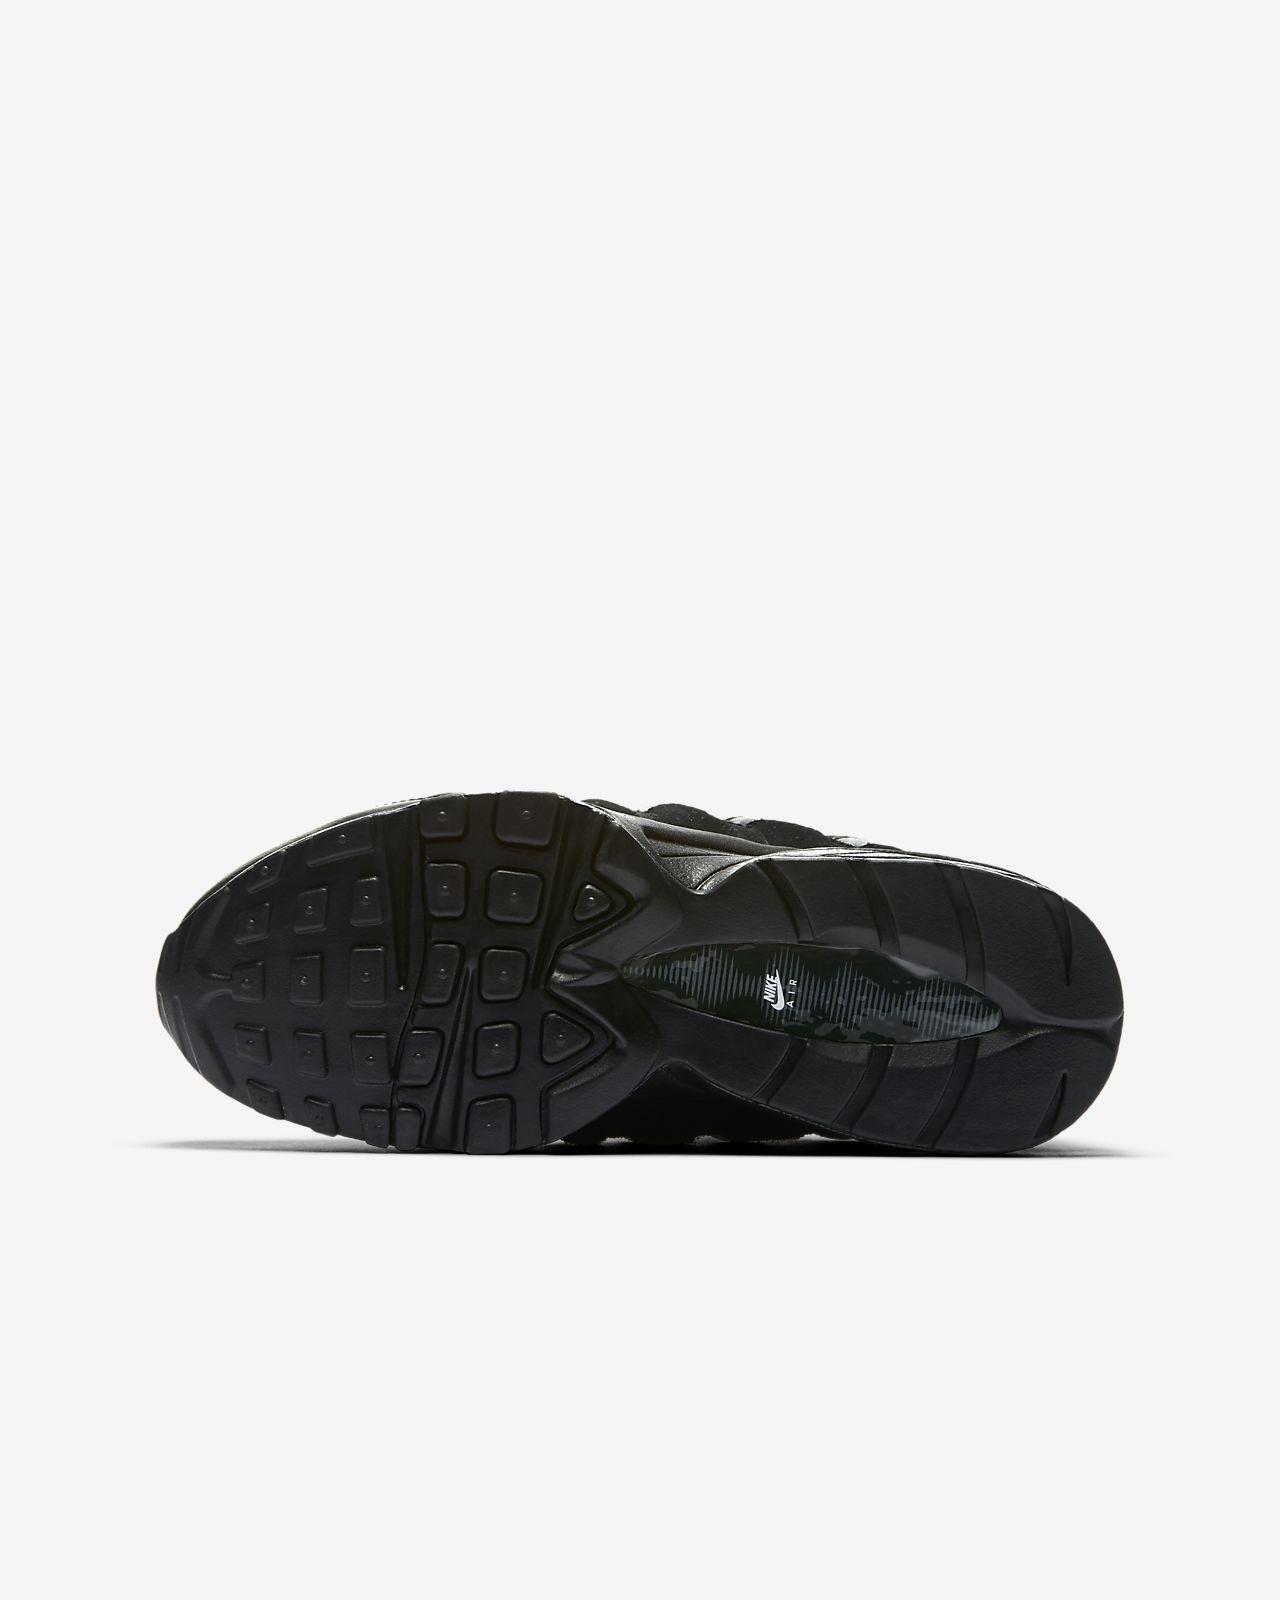 Nike Air Max 95 Kinderschoen